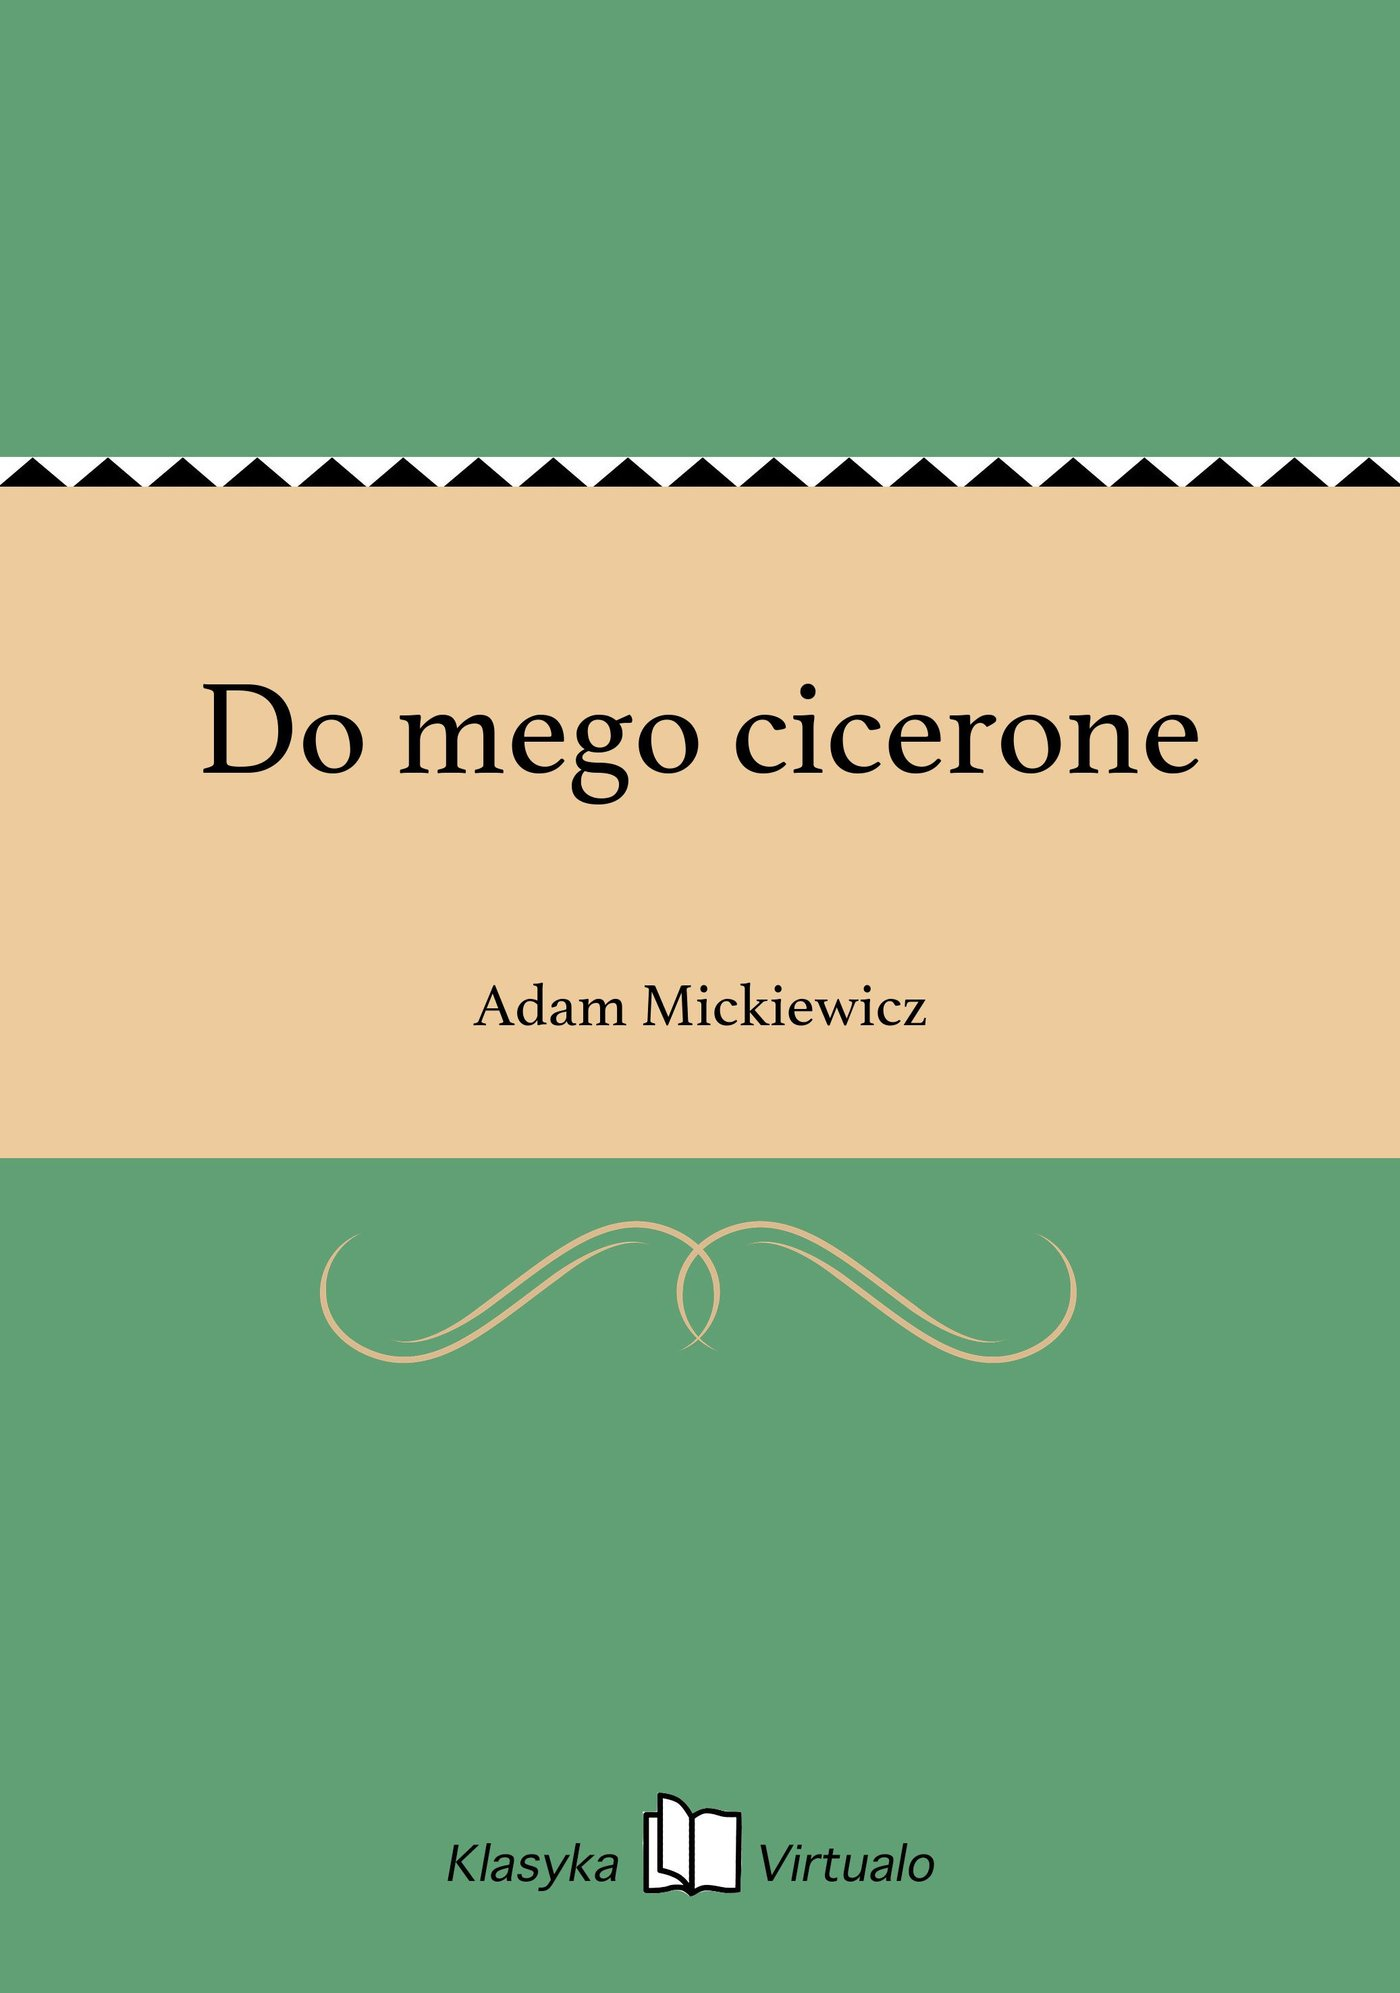 Do mego cicerone - Ebook (Książka EPUB) do pobrania w formacie EPUB